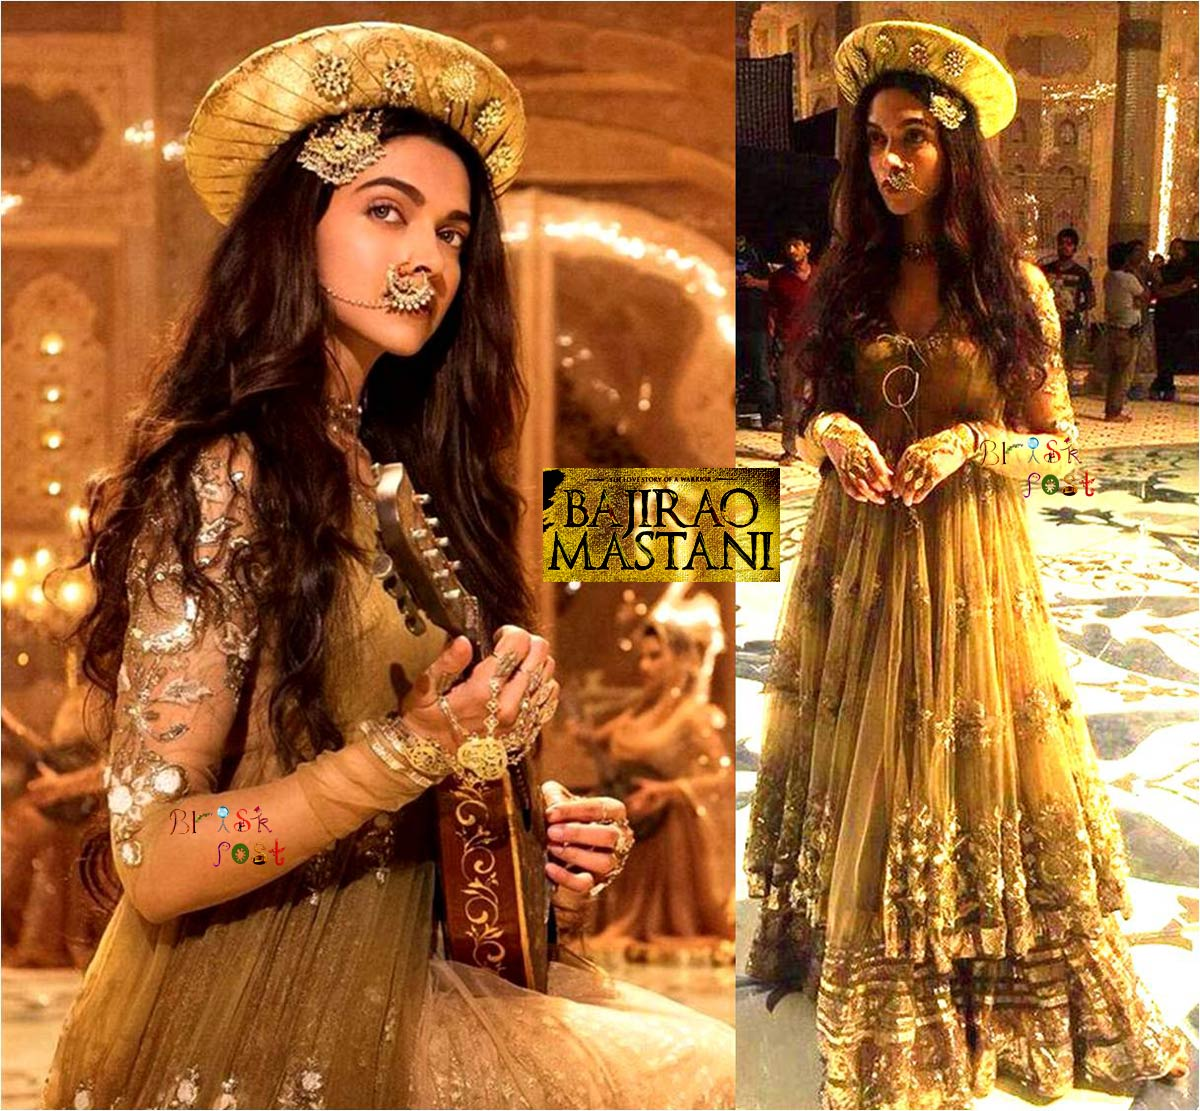 Deewani Mastani Deepika Padukone of Bajirao Ranveer Singh as Golden Apsara in Mughal Princess